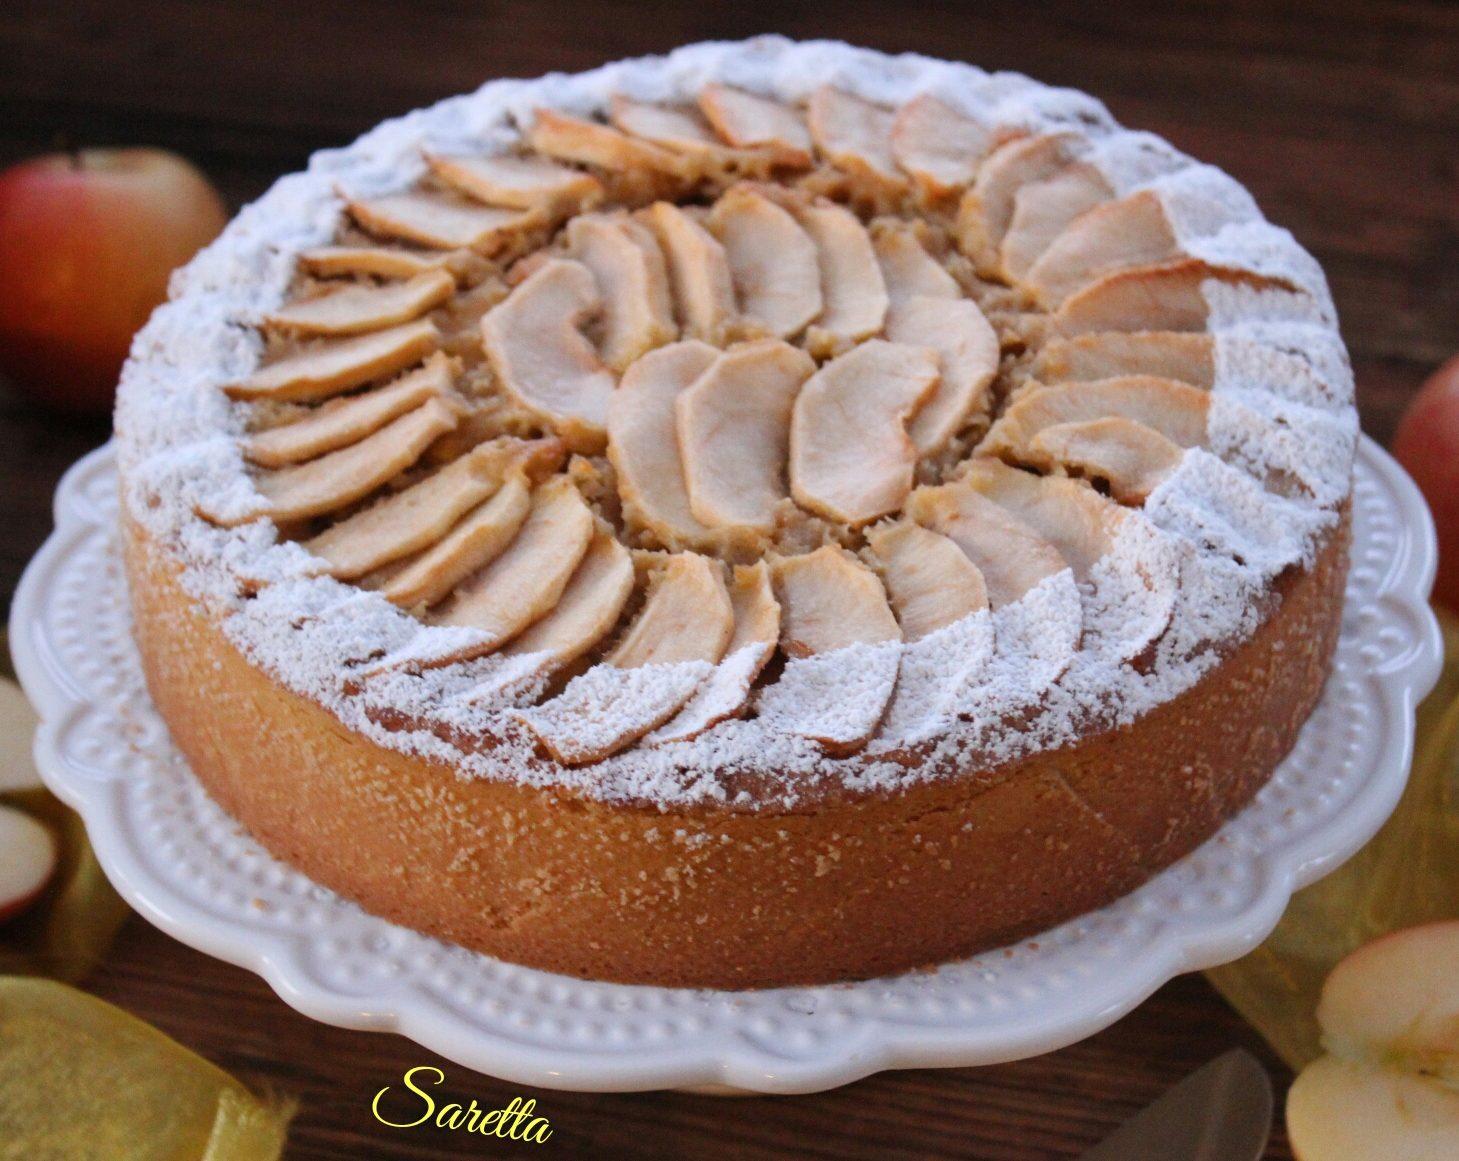 Ricetta Torta Di Mele Bake Off Italia.Apple Pie Di Damiano Carrara Torta Di Mele Bake Off Italia 2018 Cucina Con Saretta